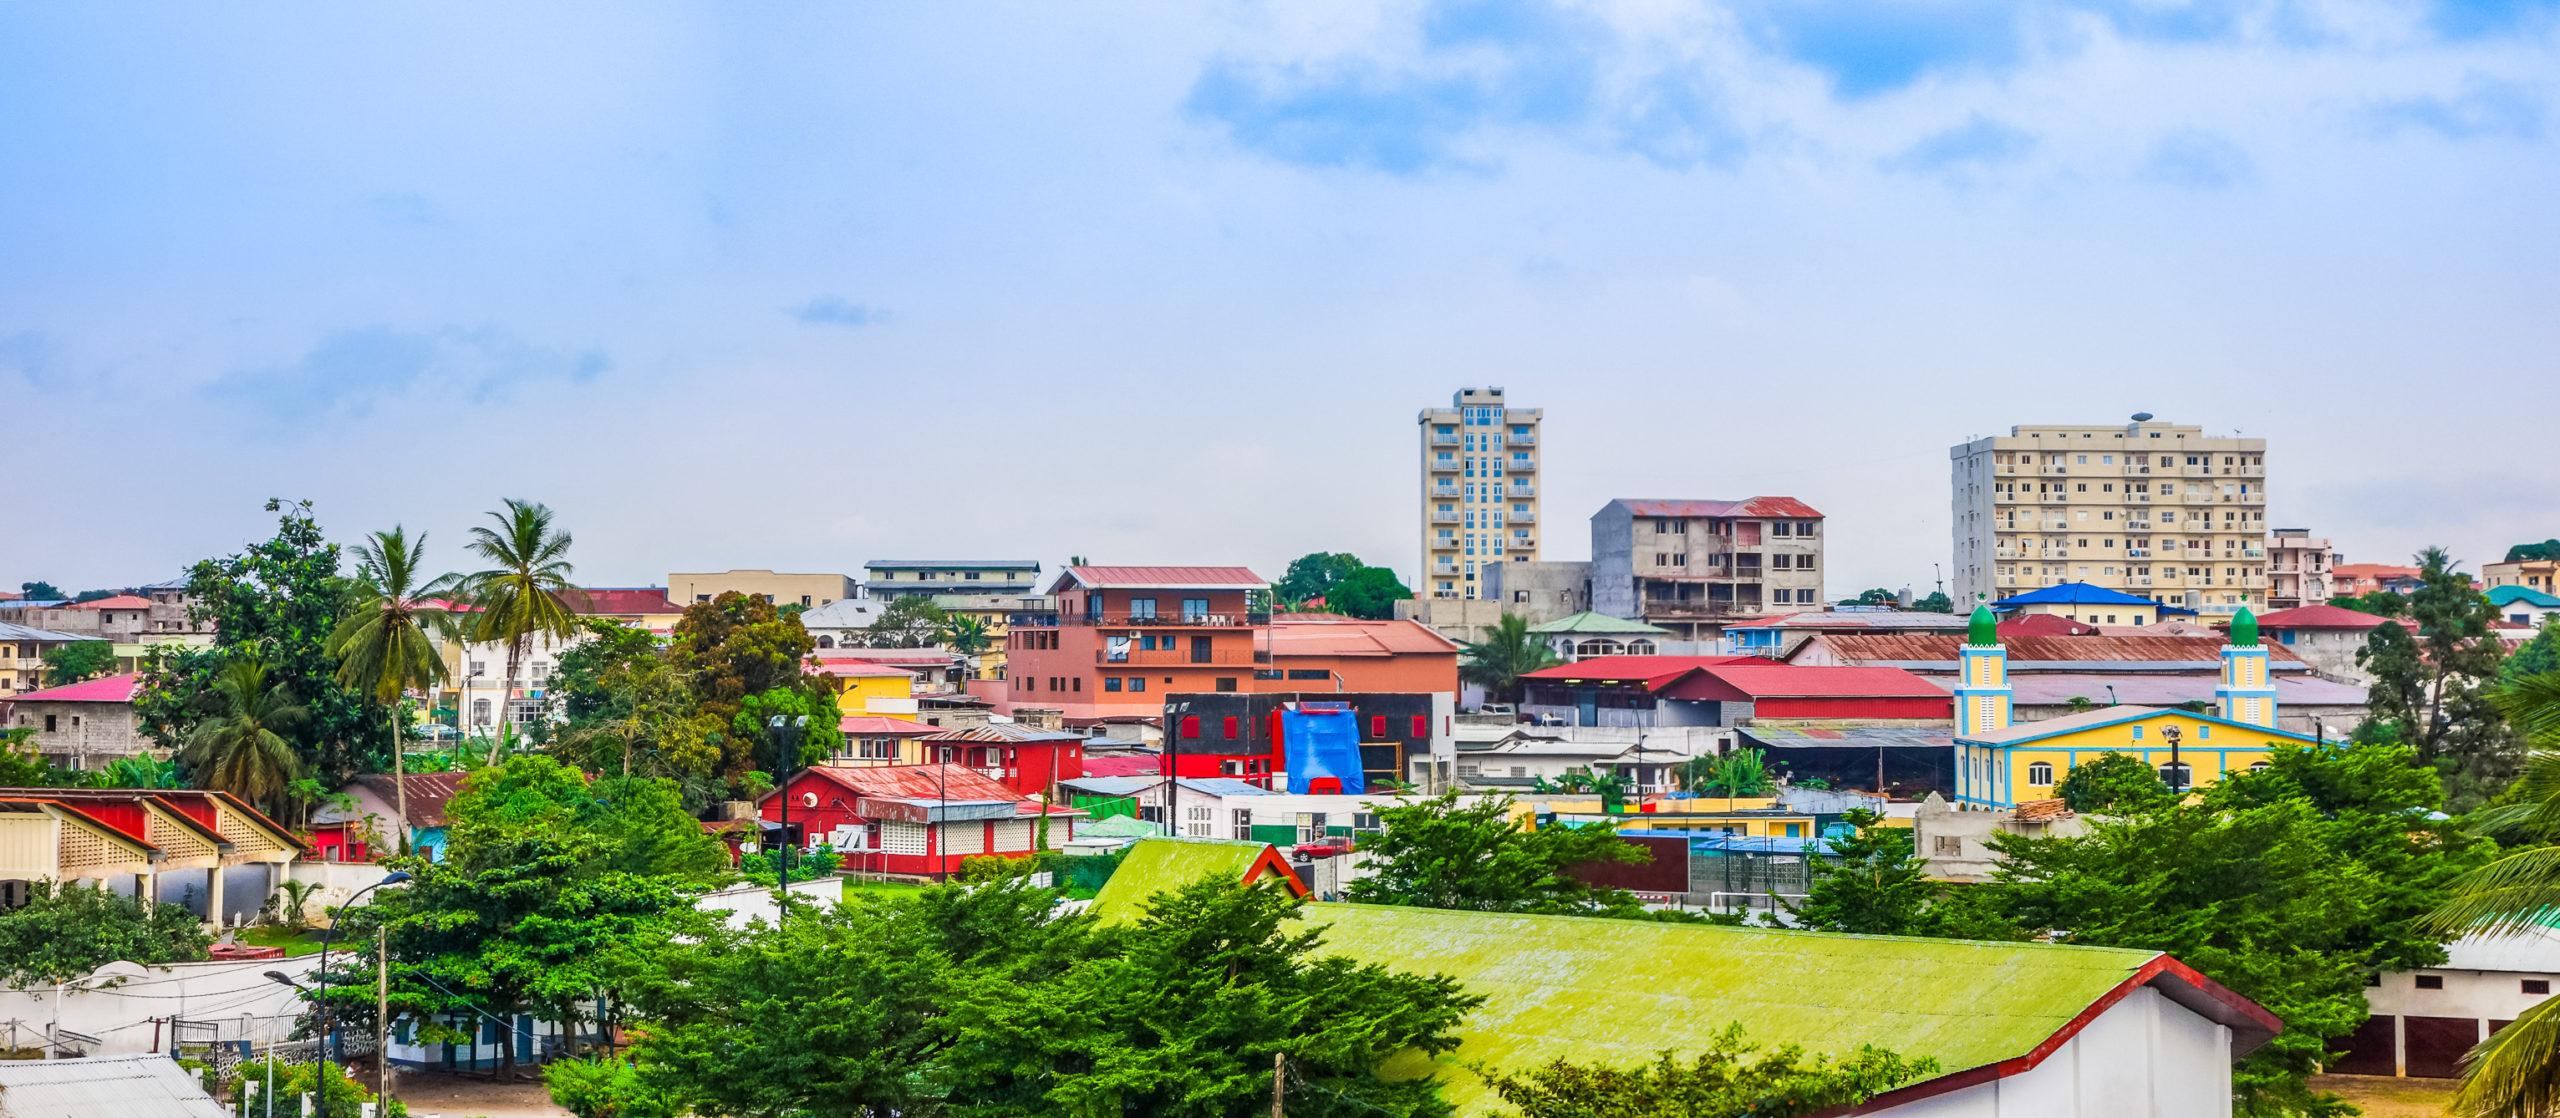 Equatorial Guinea [shutterstock]